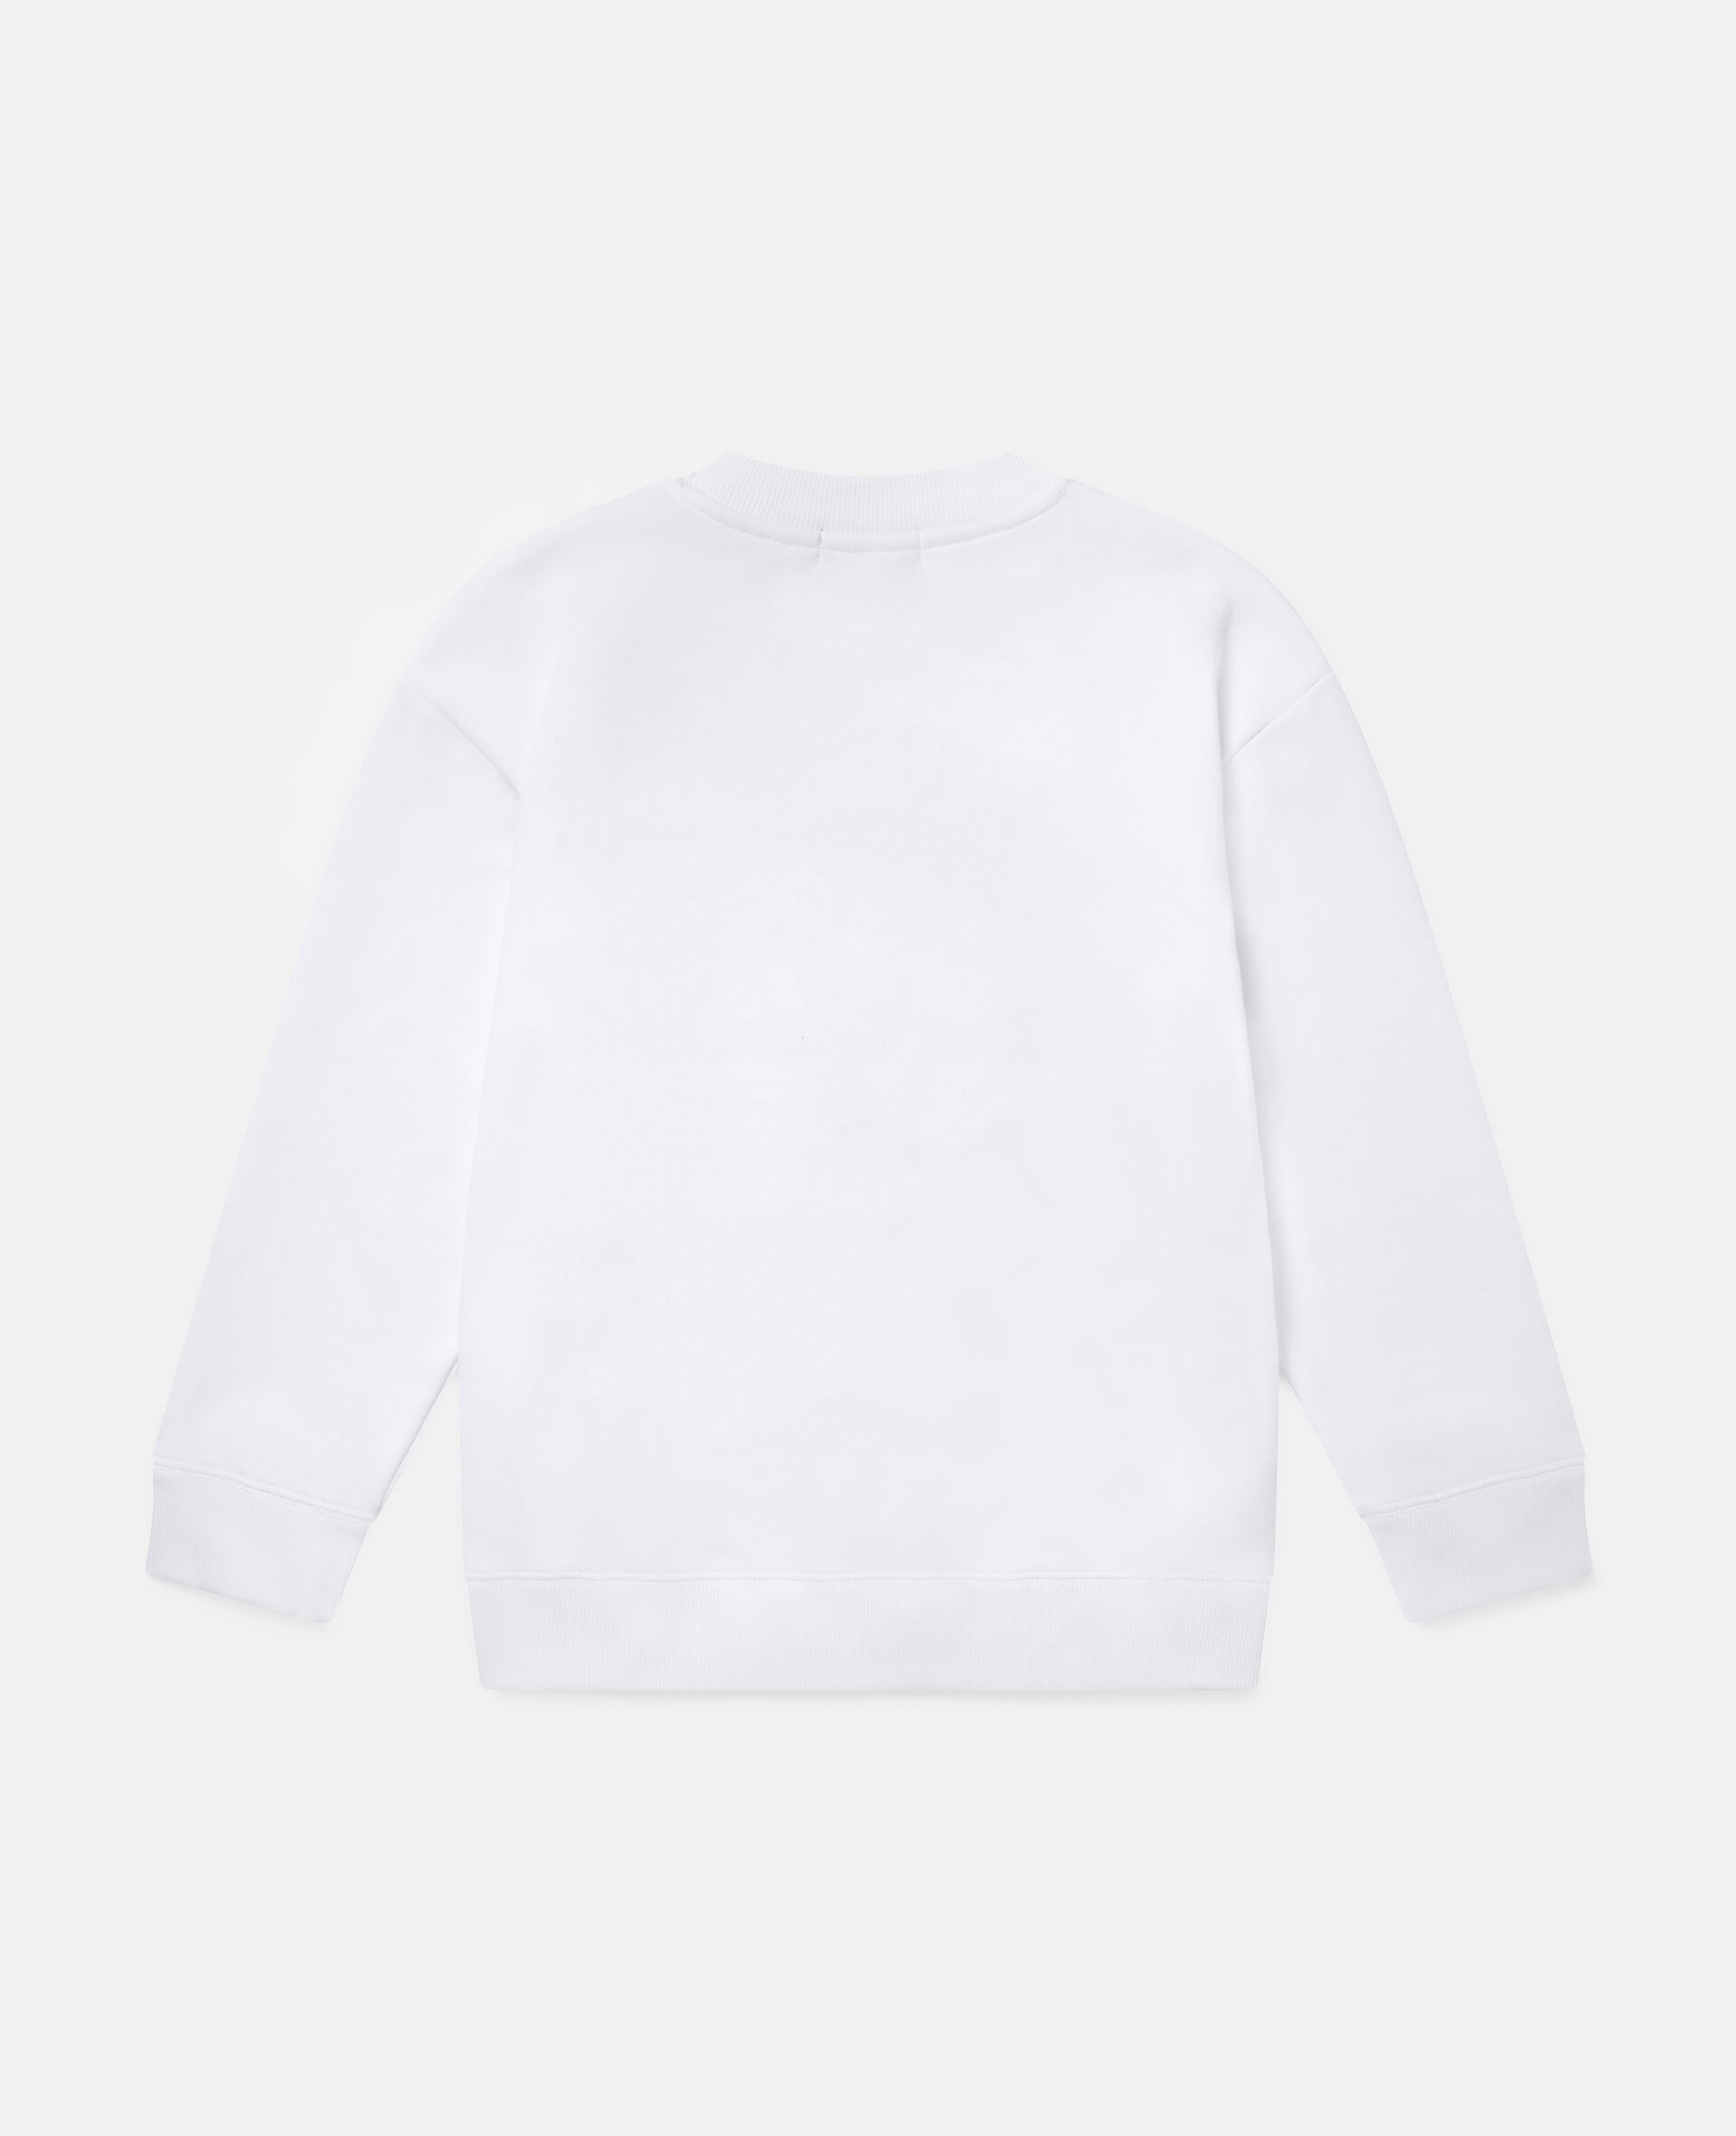 Pizza Skater Fleece Sweatshirt-White-large image number 3